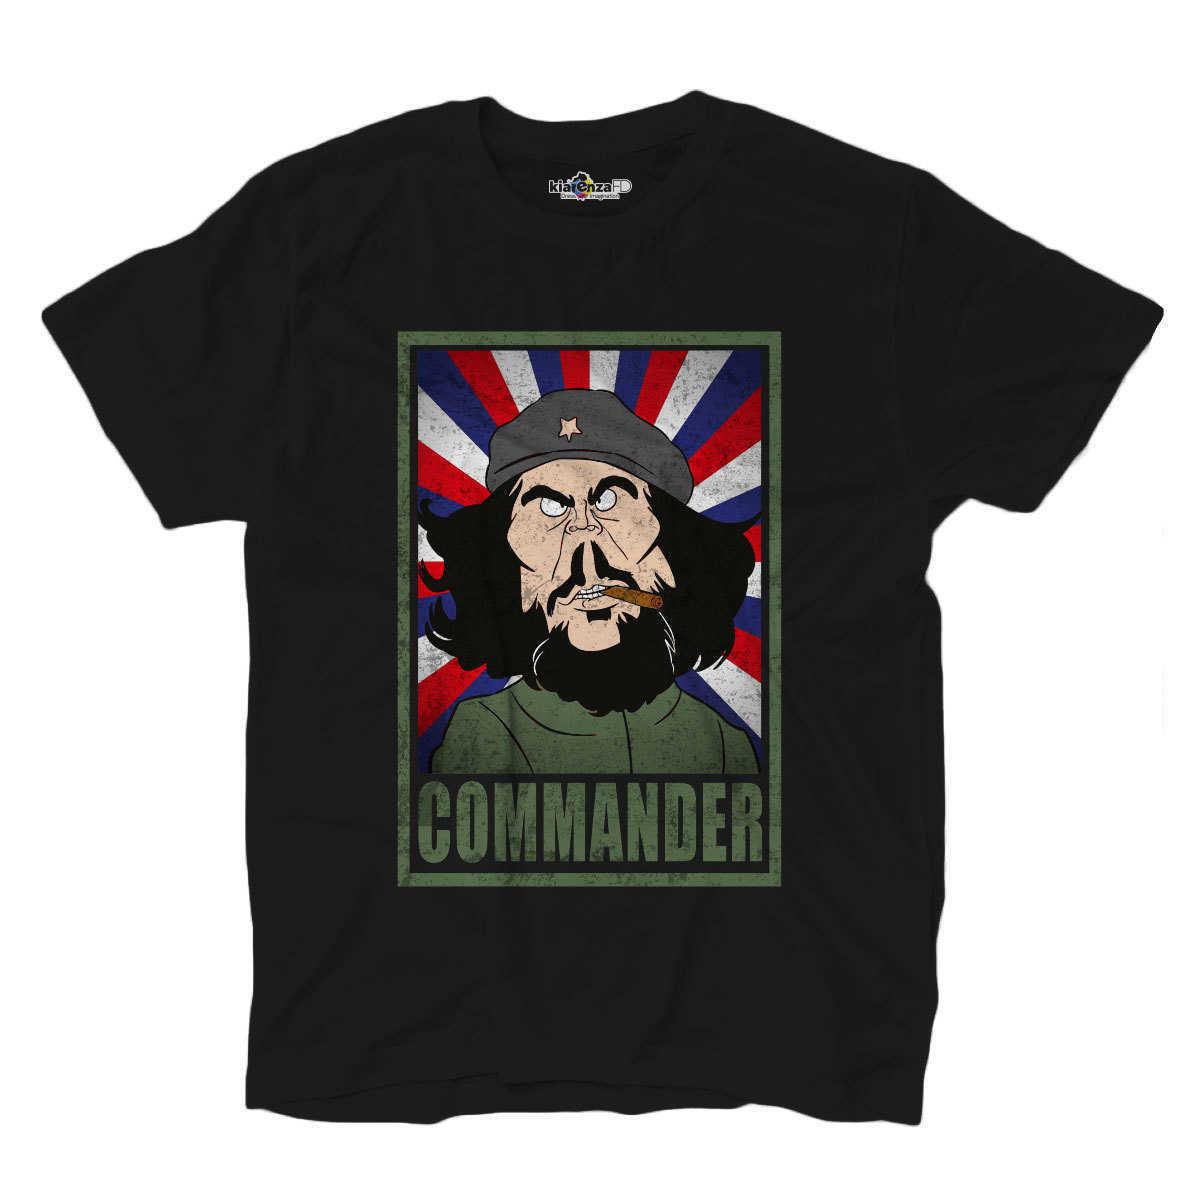 Camiseta parodia caricatura política Commander líder Guerrero Cuba S